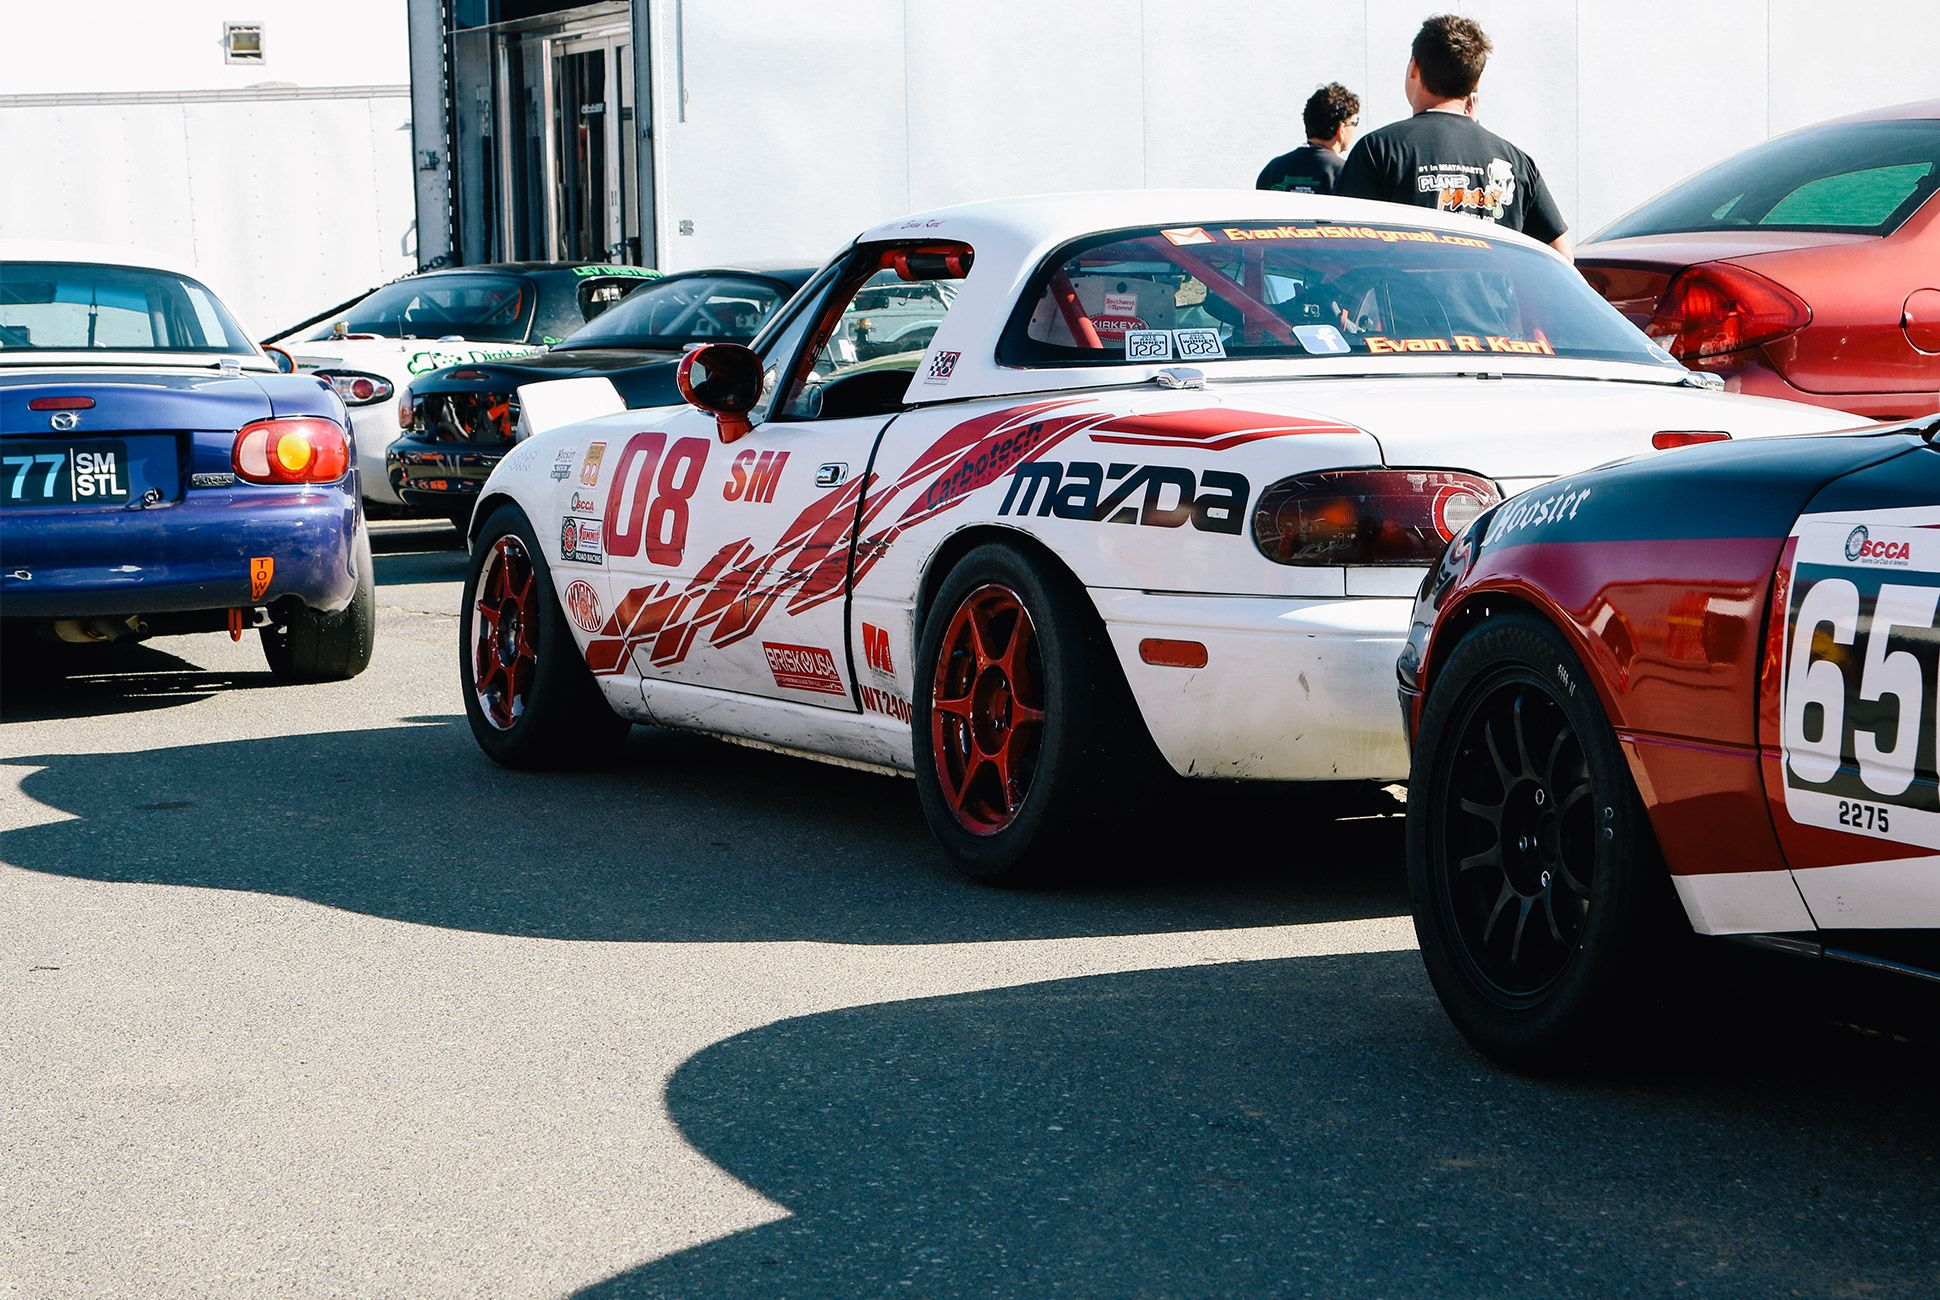 Mazda-Miata-The-Best-Vintage-Sportscar-gear-patrol-8